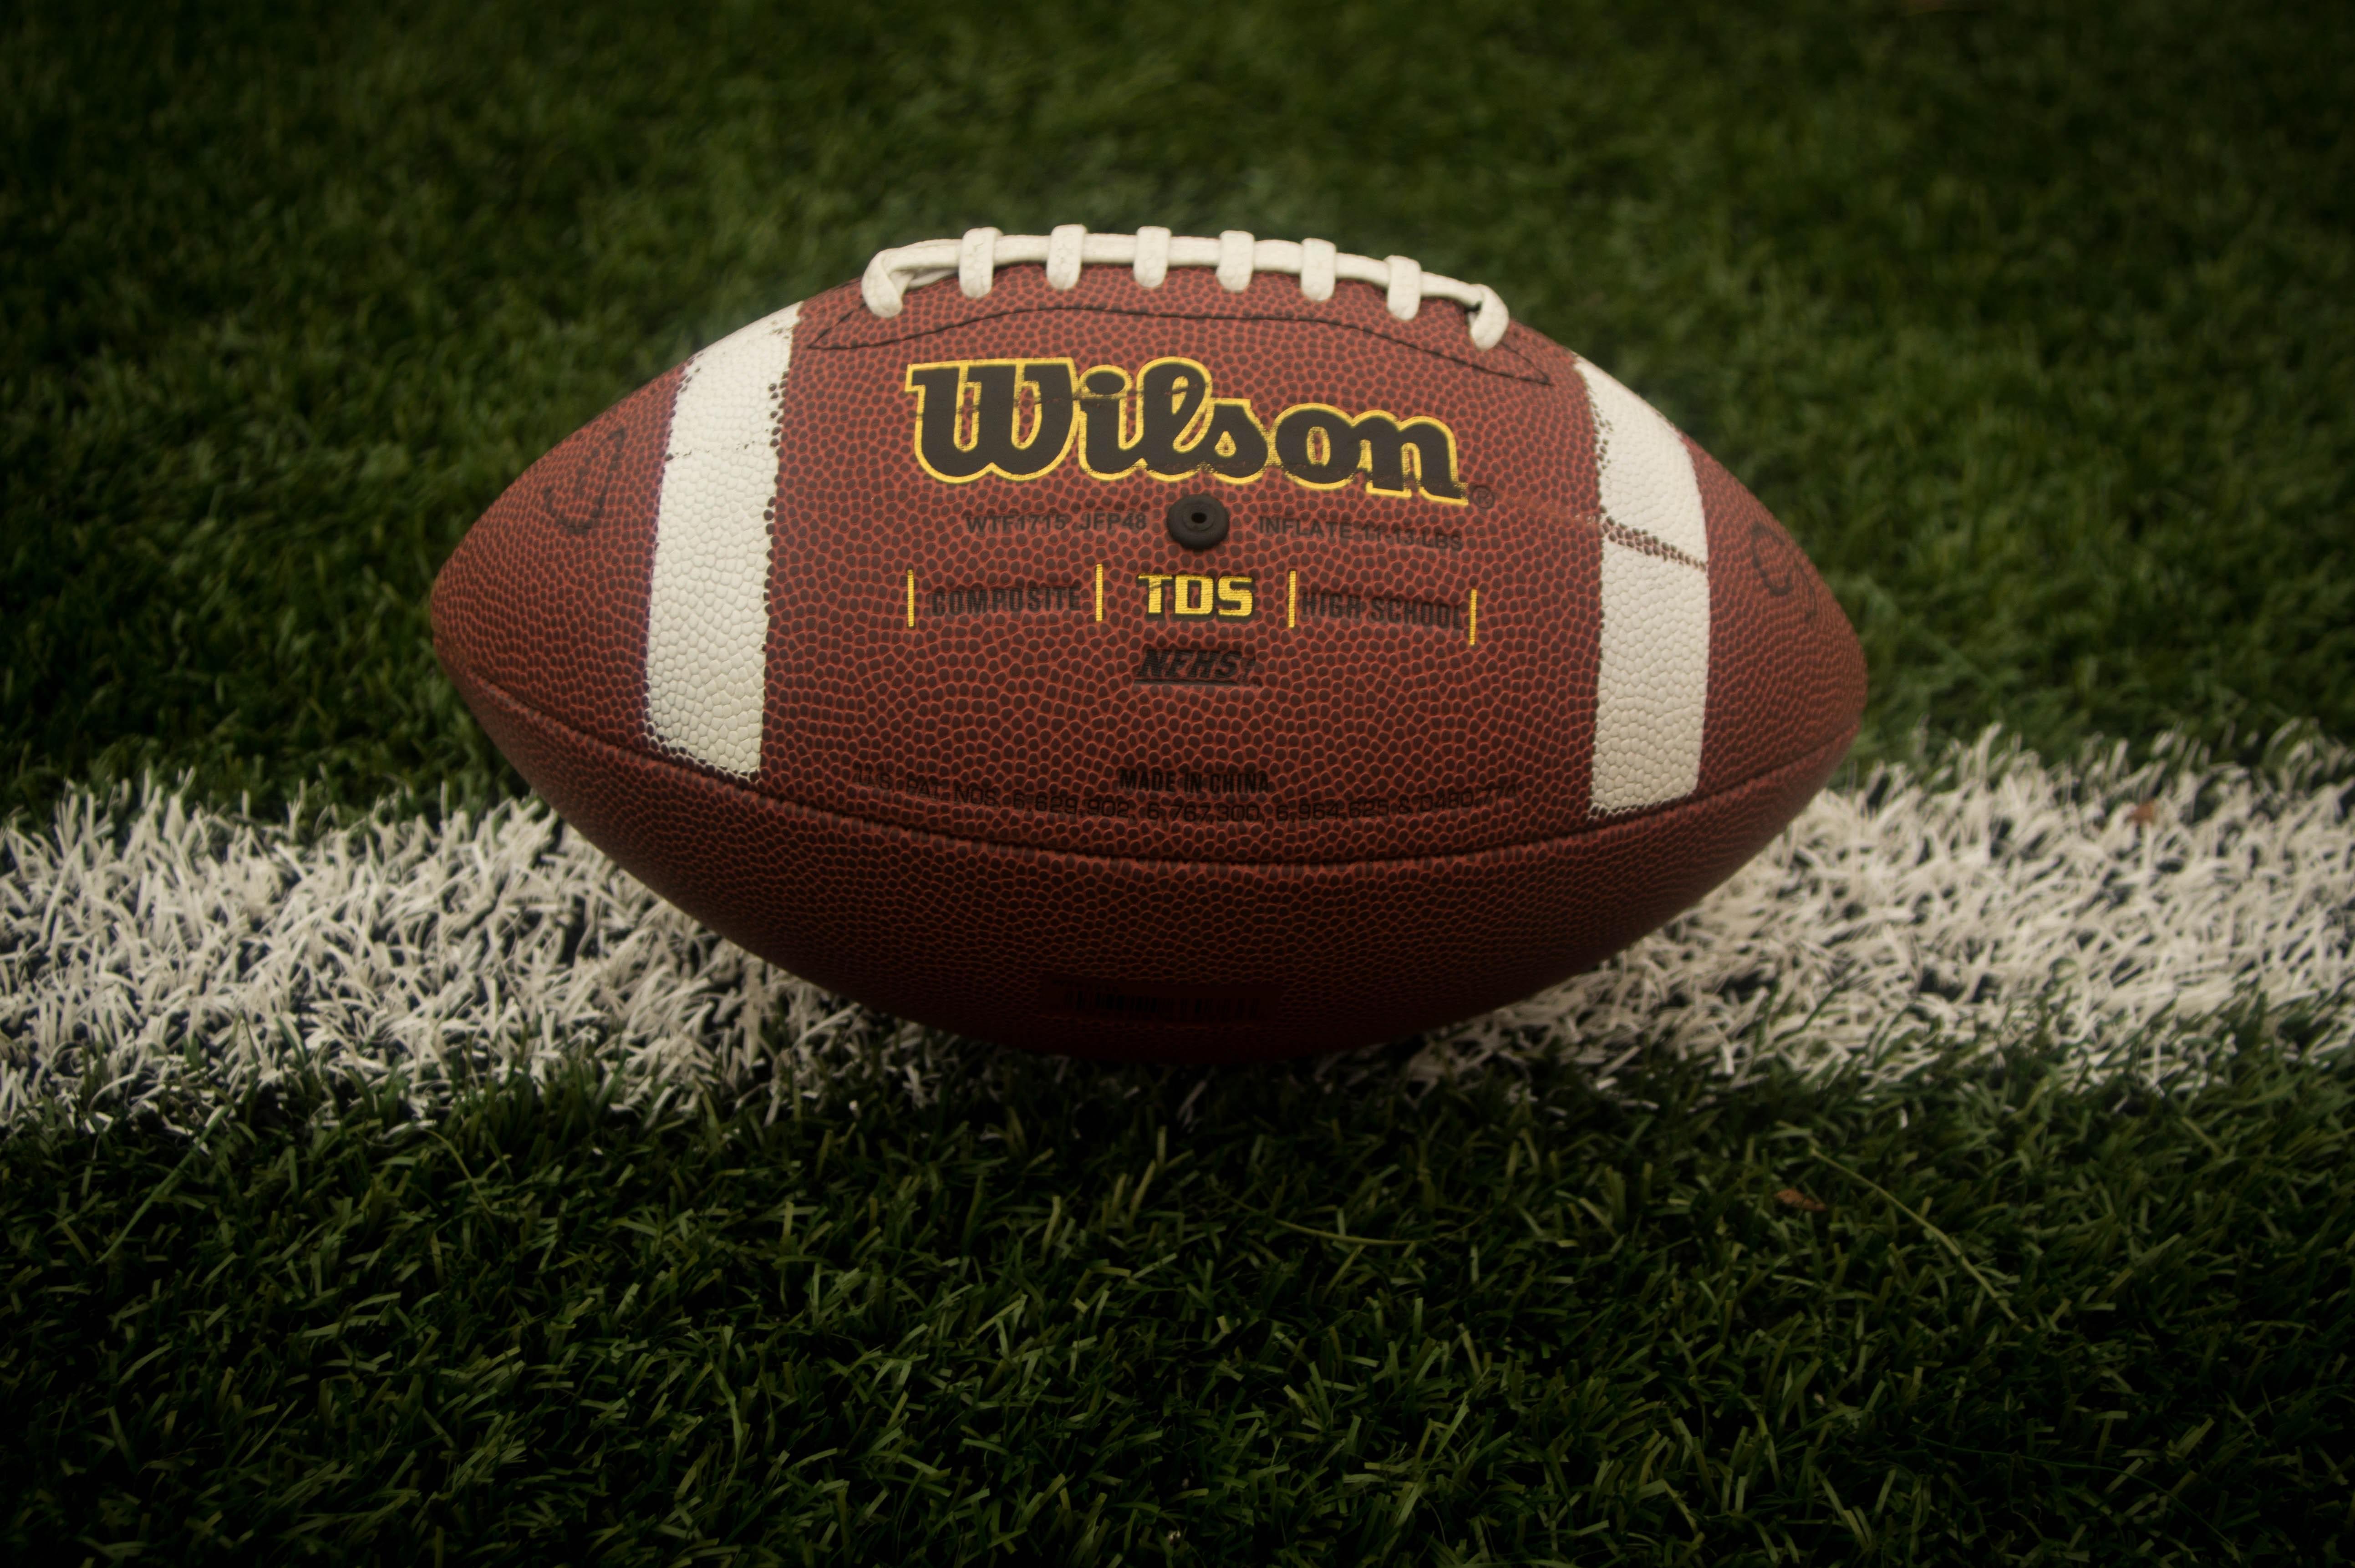 NASH Nine: Reasons We Love Football Season